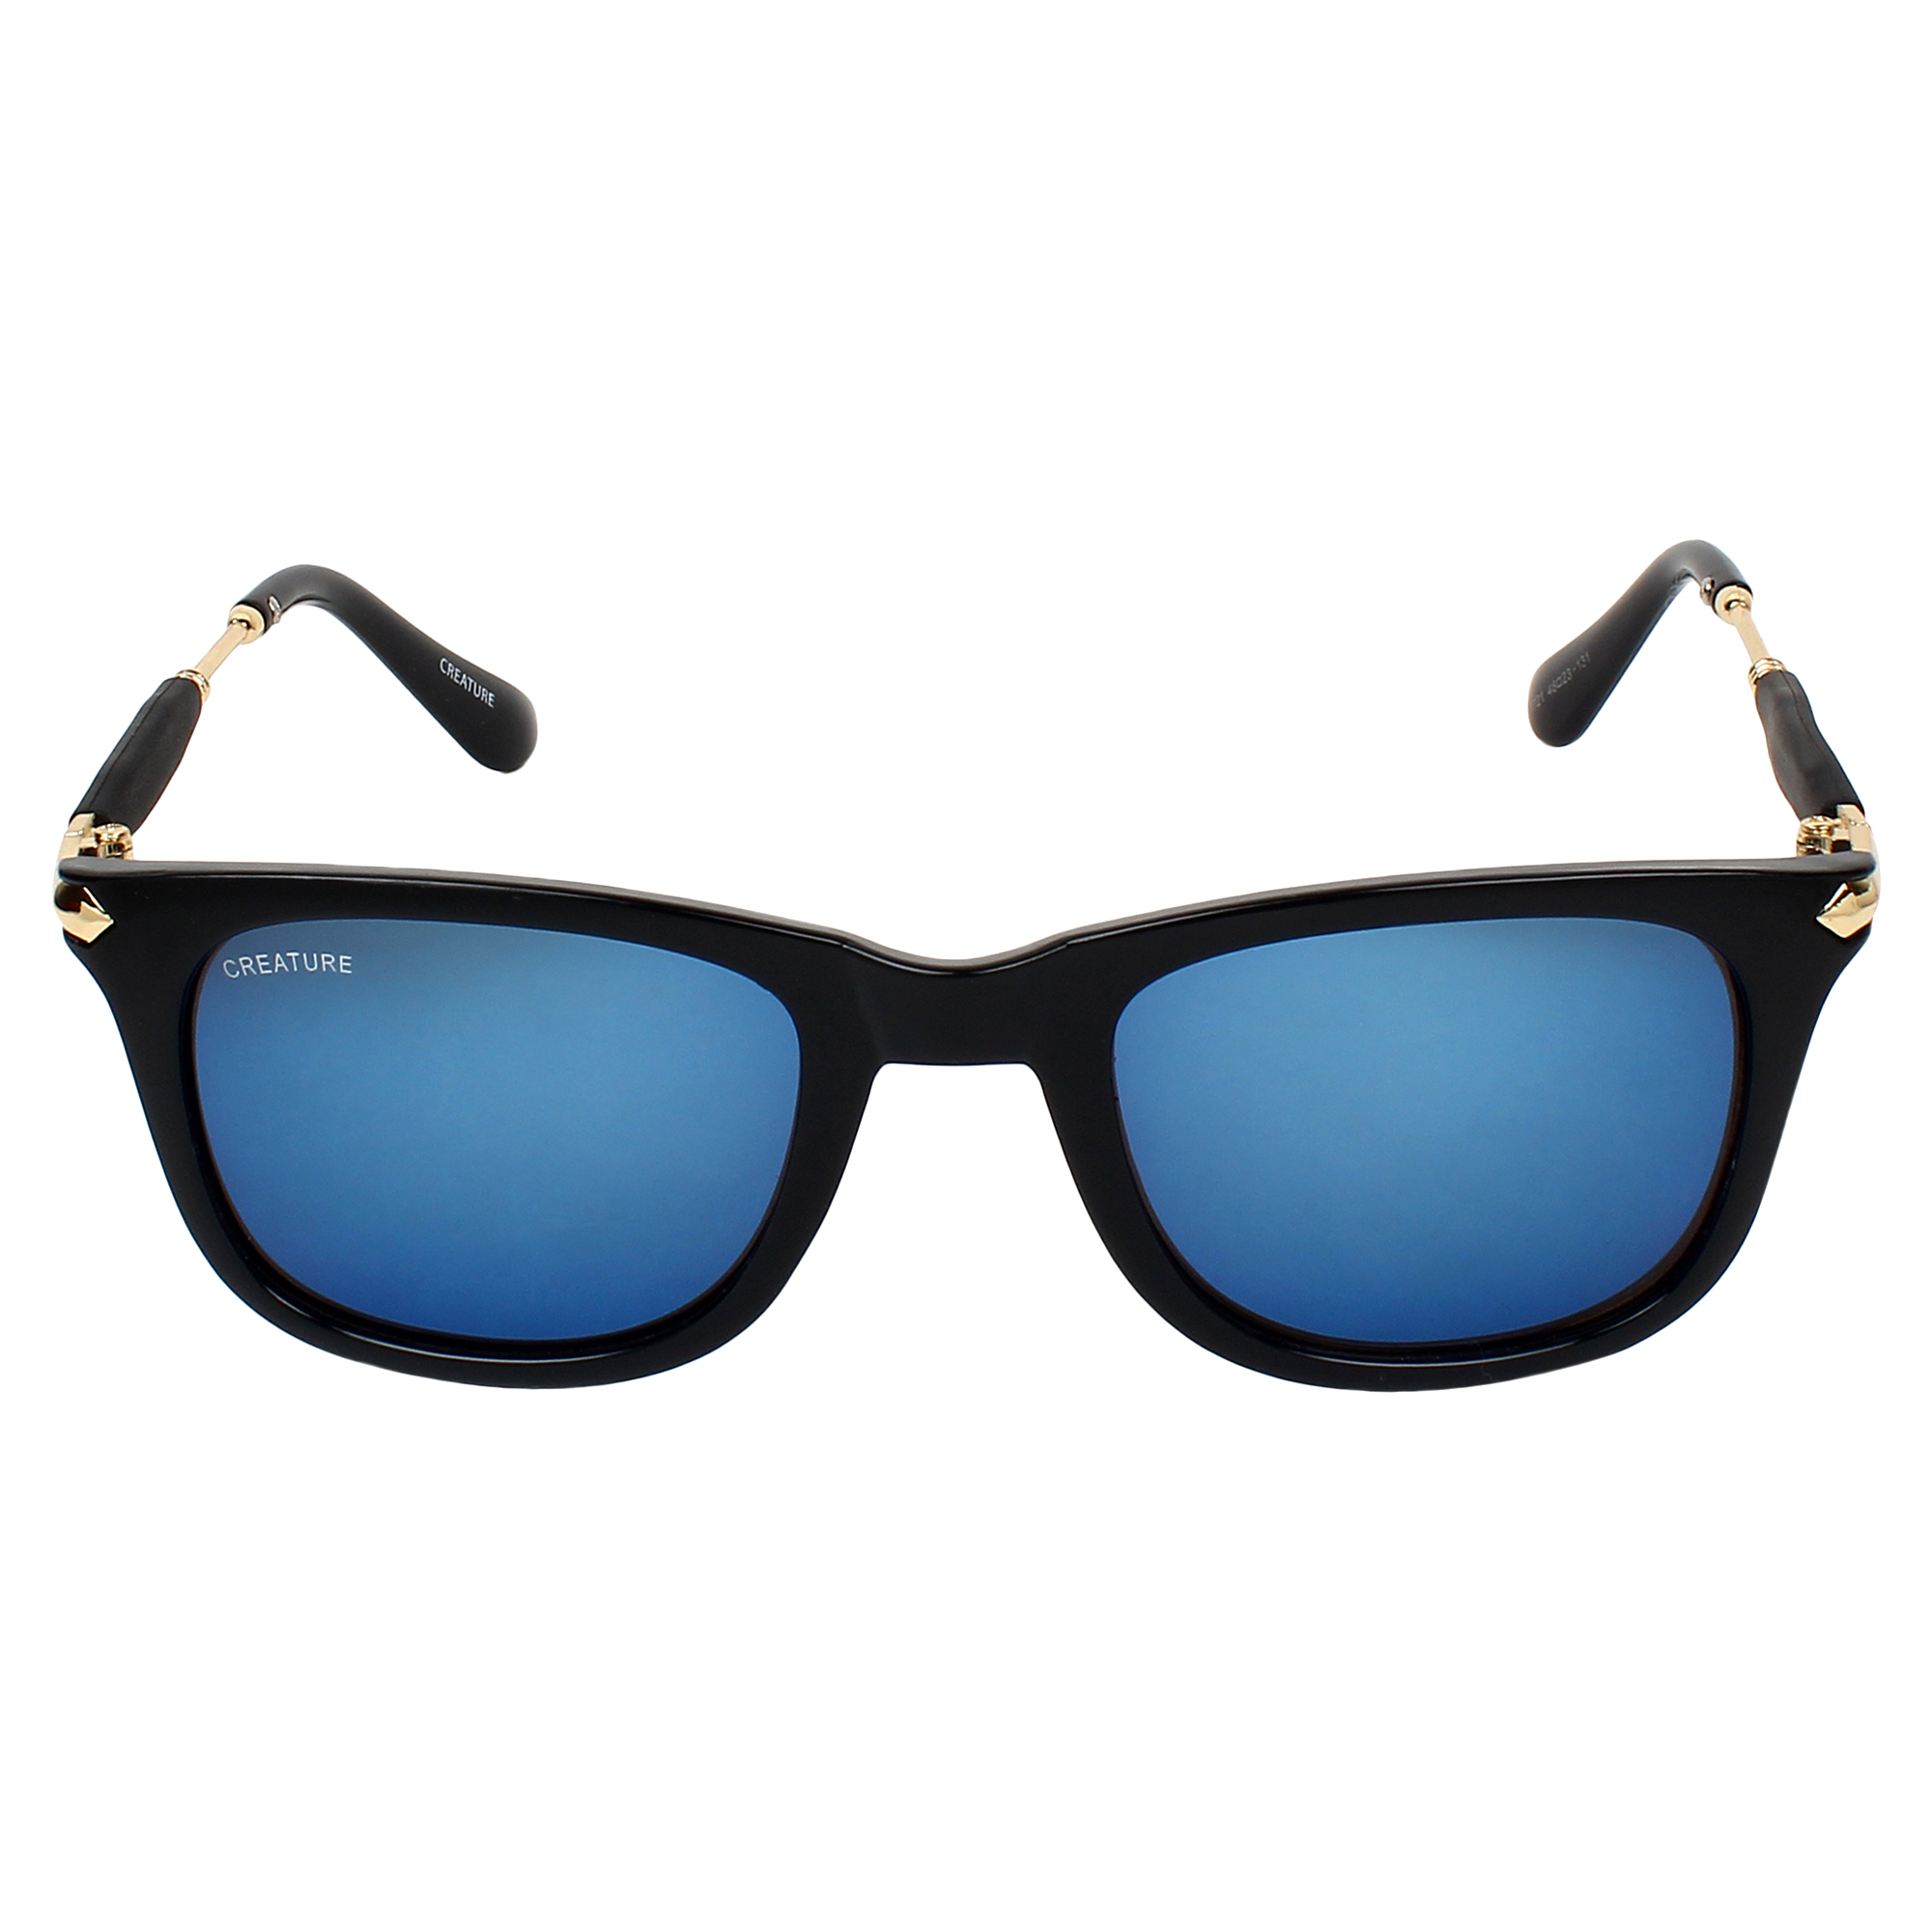 CREATURE | CREATURE Black Gloss Finish UV Protected Unisex Sunglasses (Lens-Blue|Frame-Black)